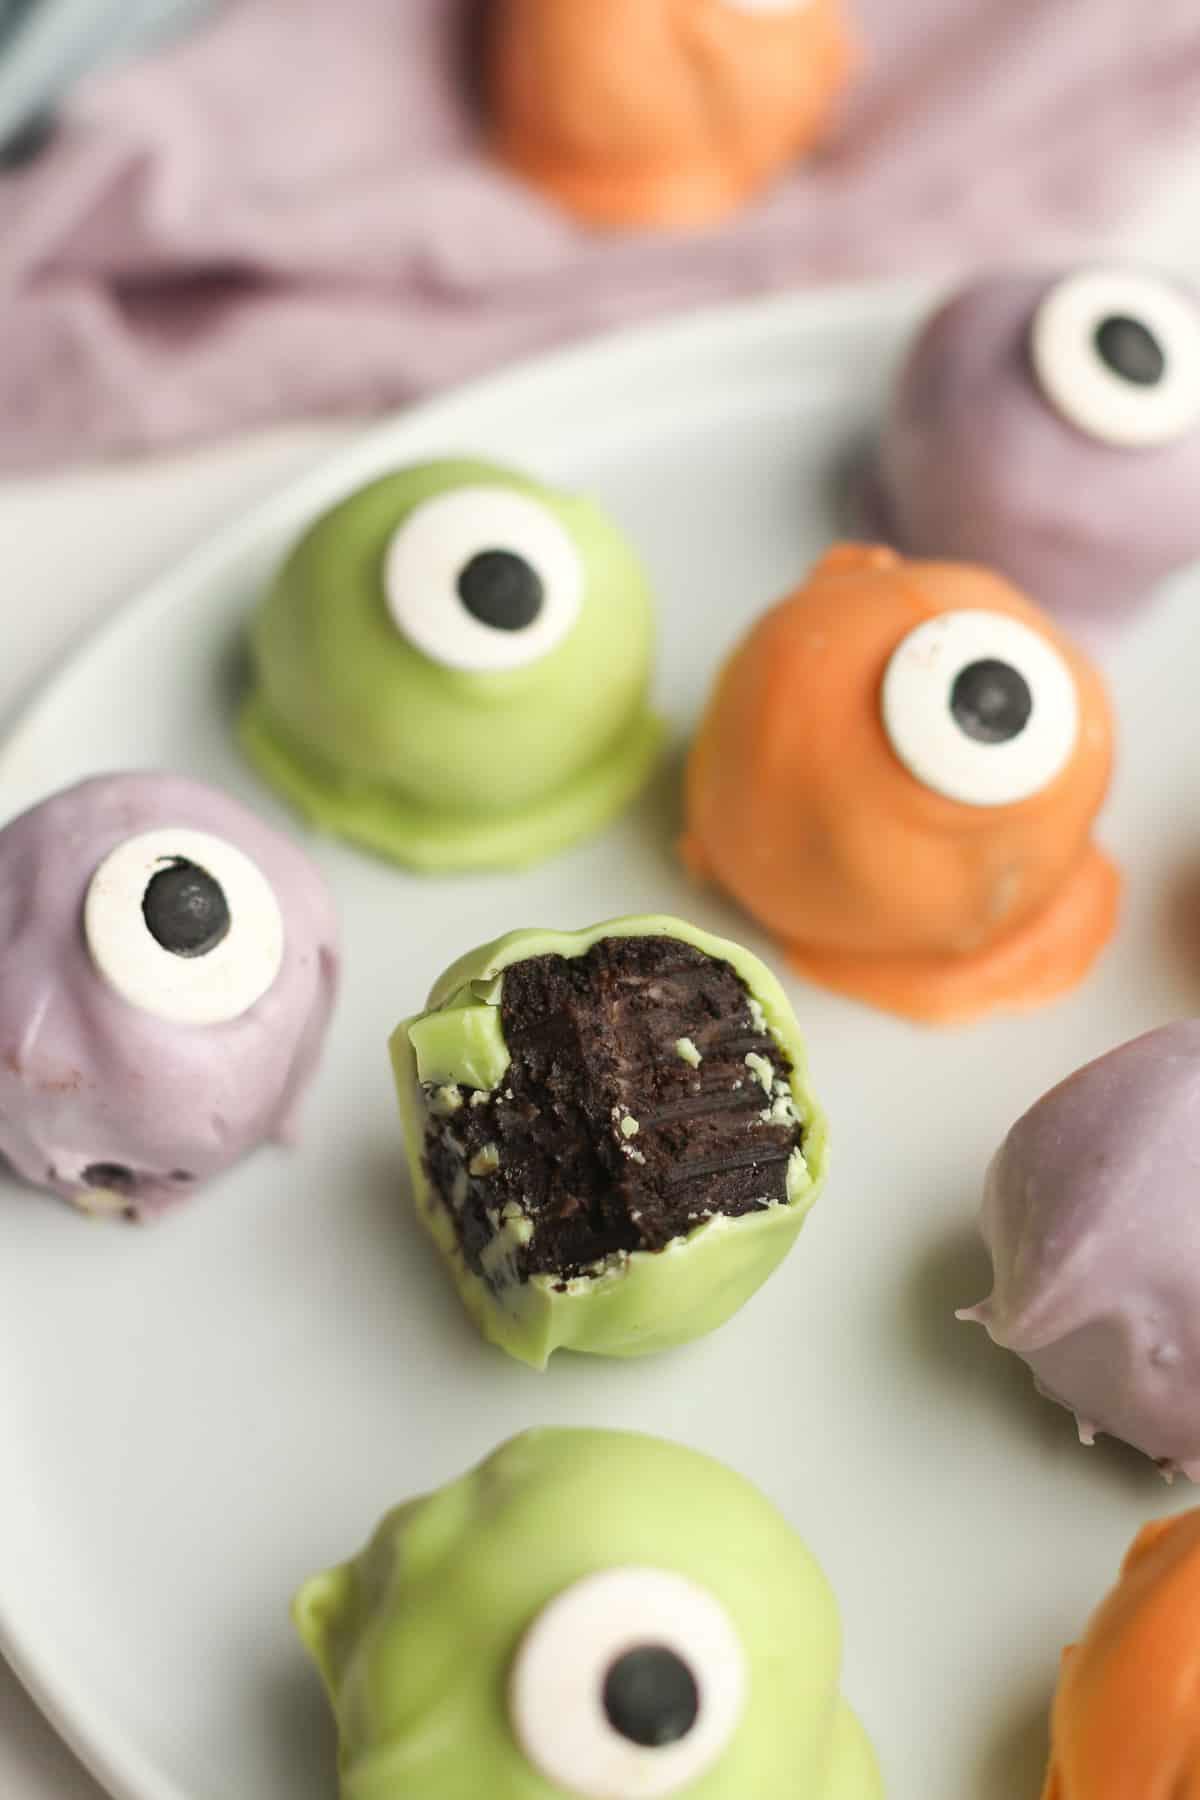 Closeup shot on an Oreo cookie eyeball that's partially eaten.